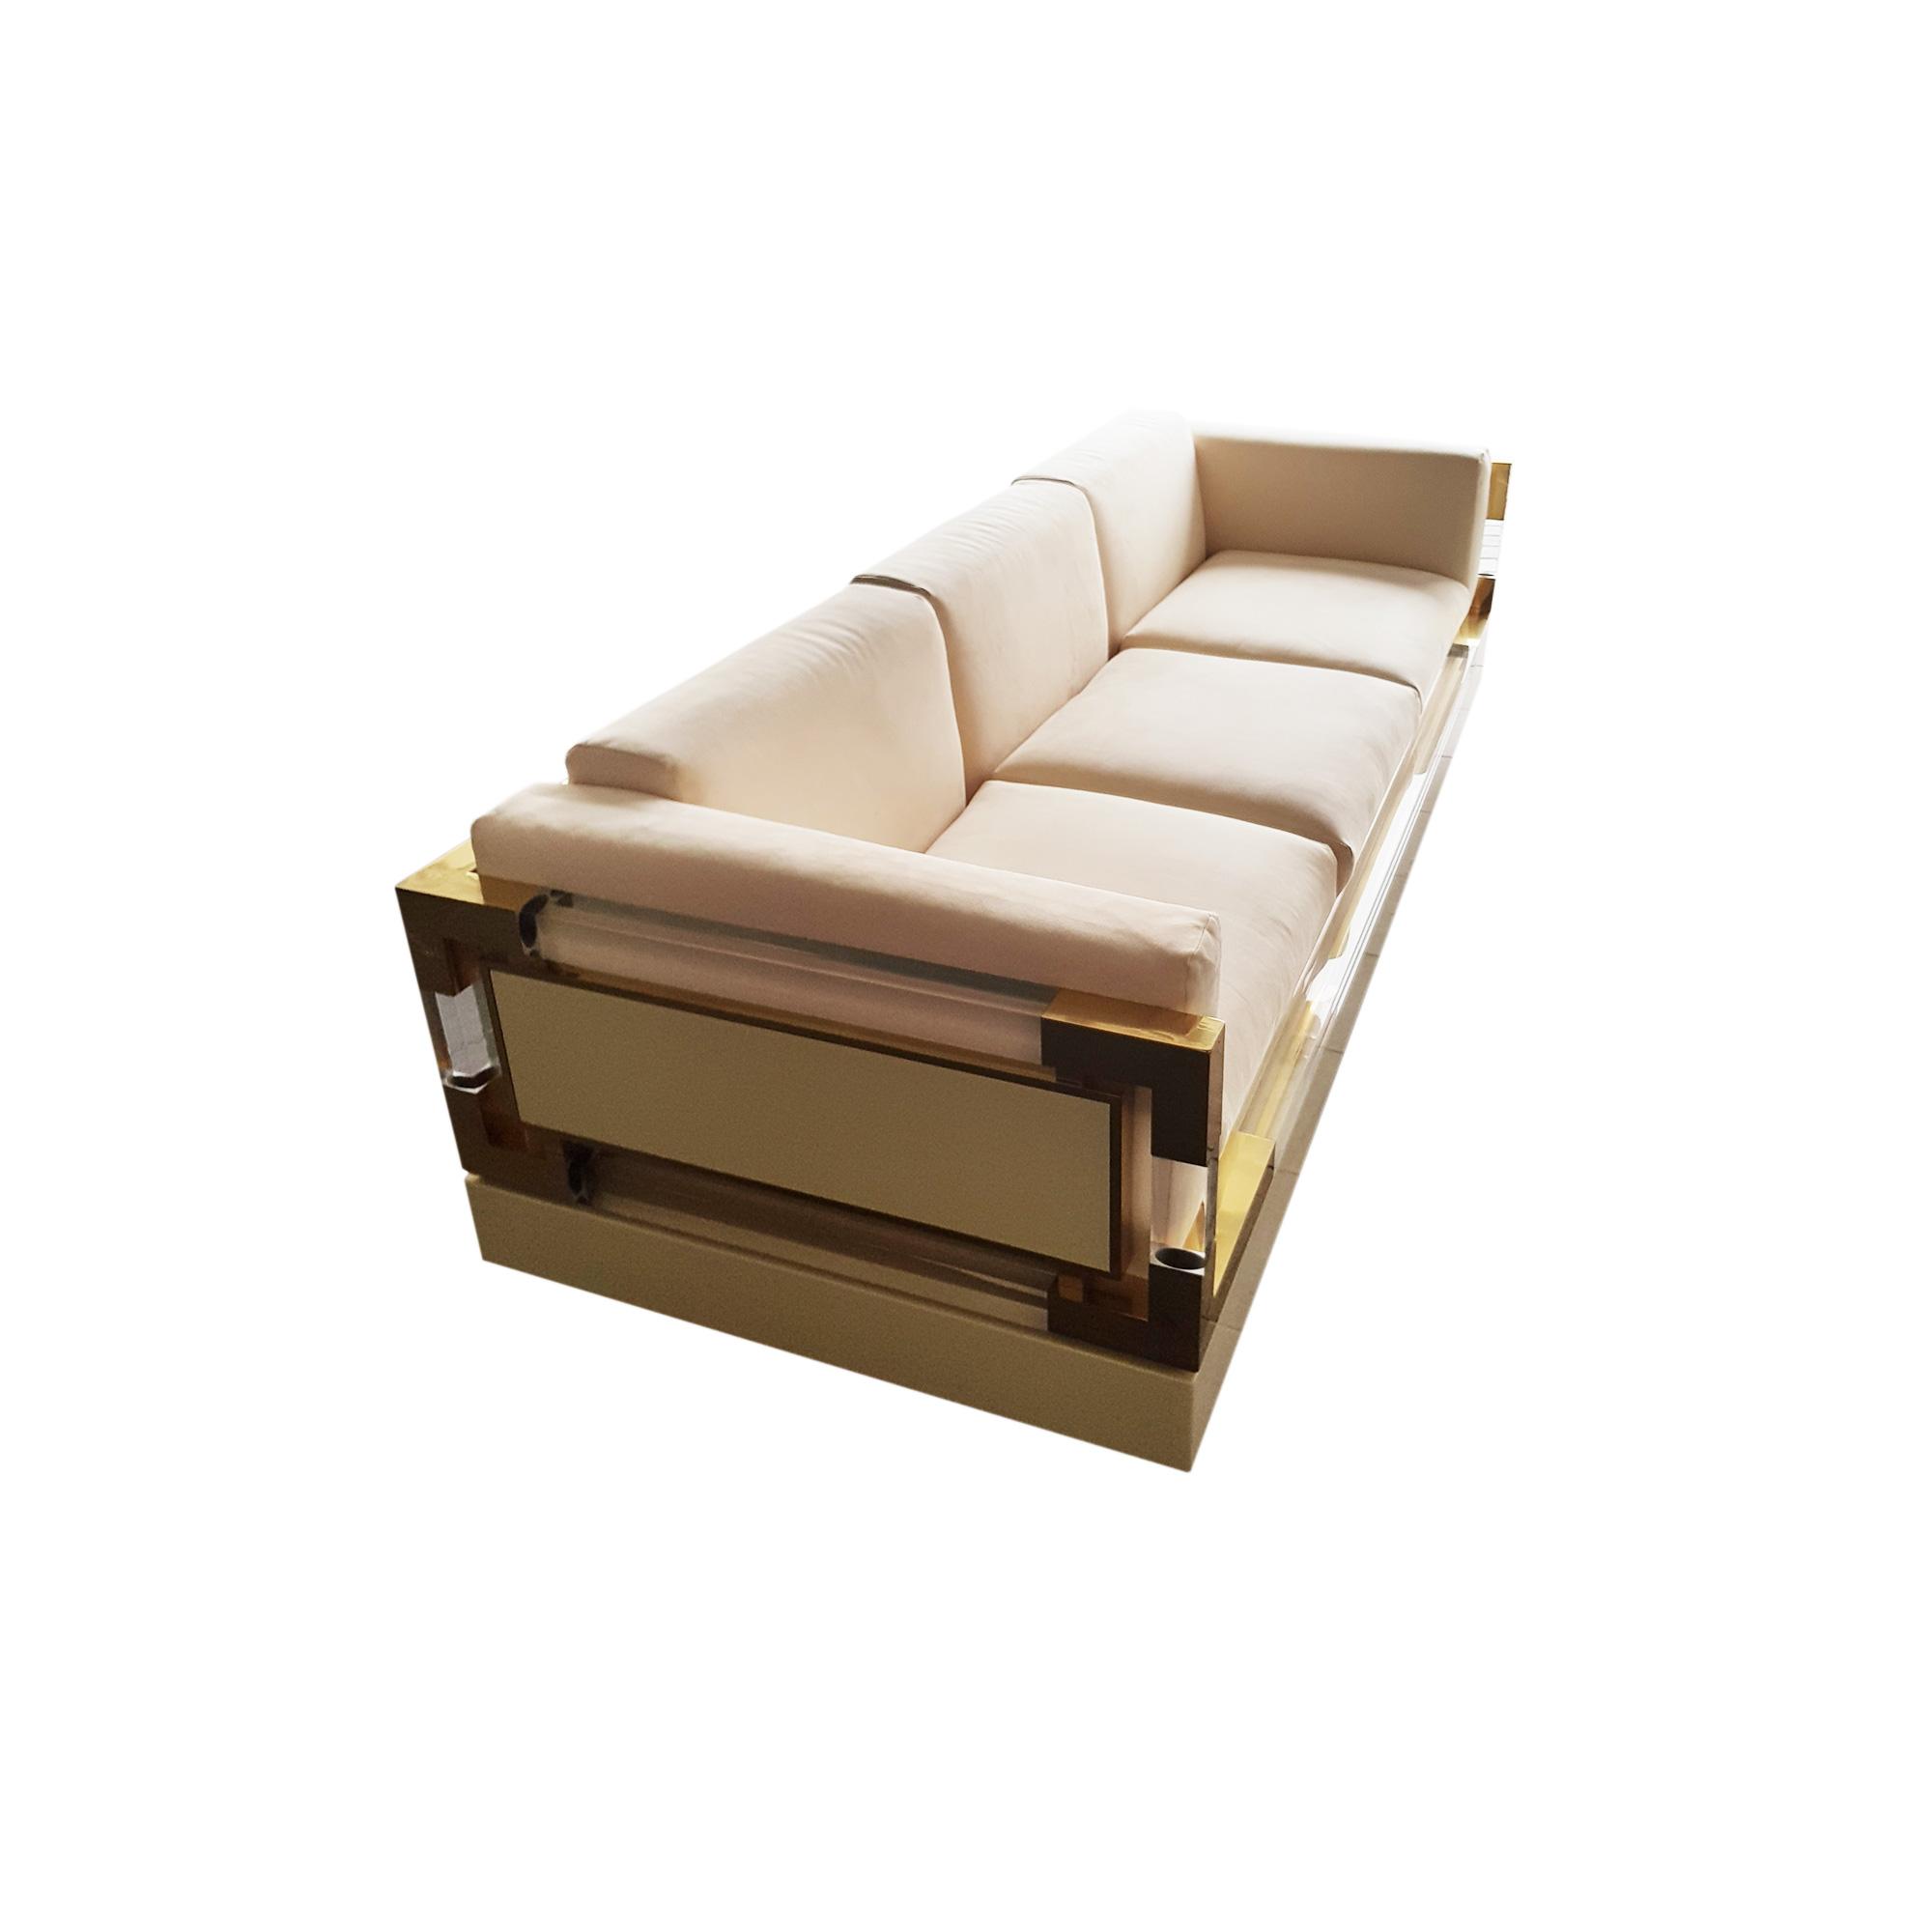 hollis jones three seater sofa